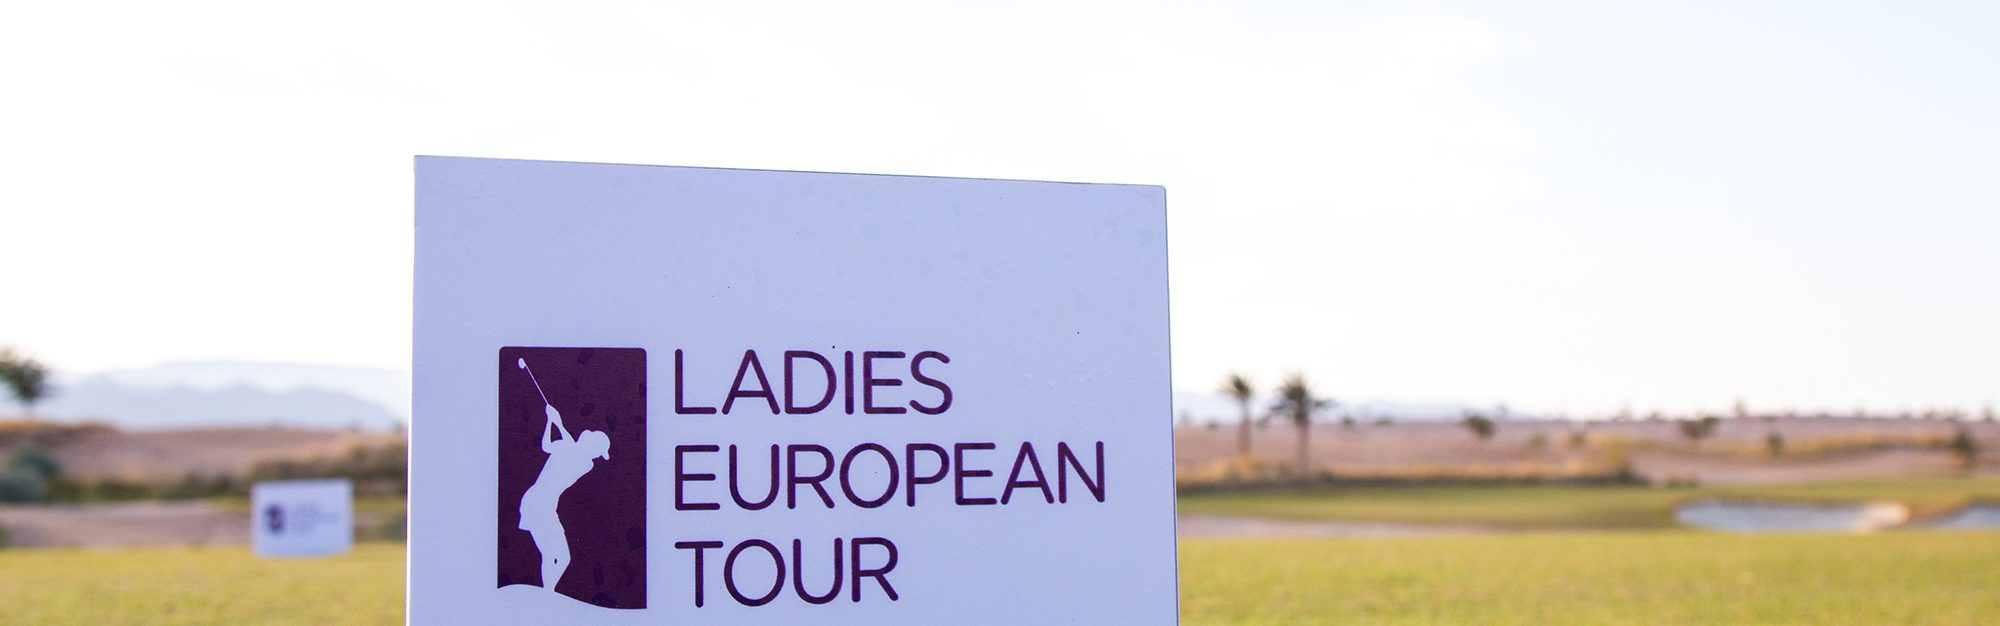 Is the Ladies European Tour set to be taken over by the LPGA?